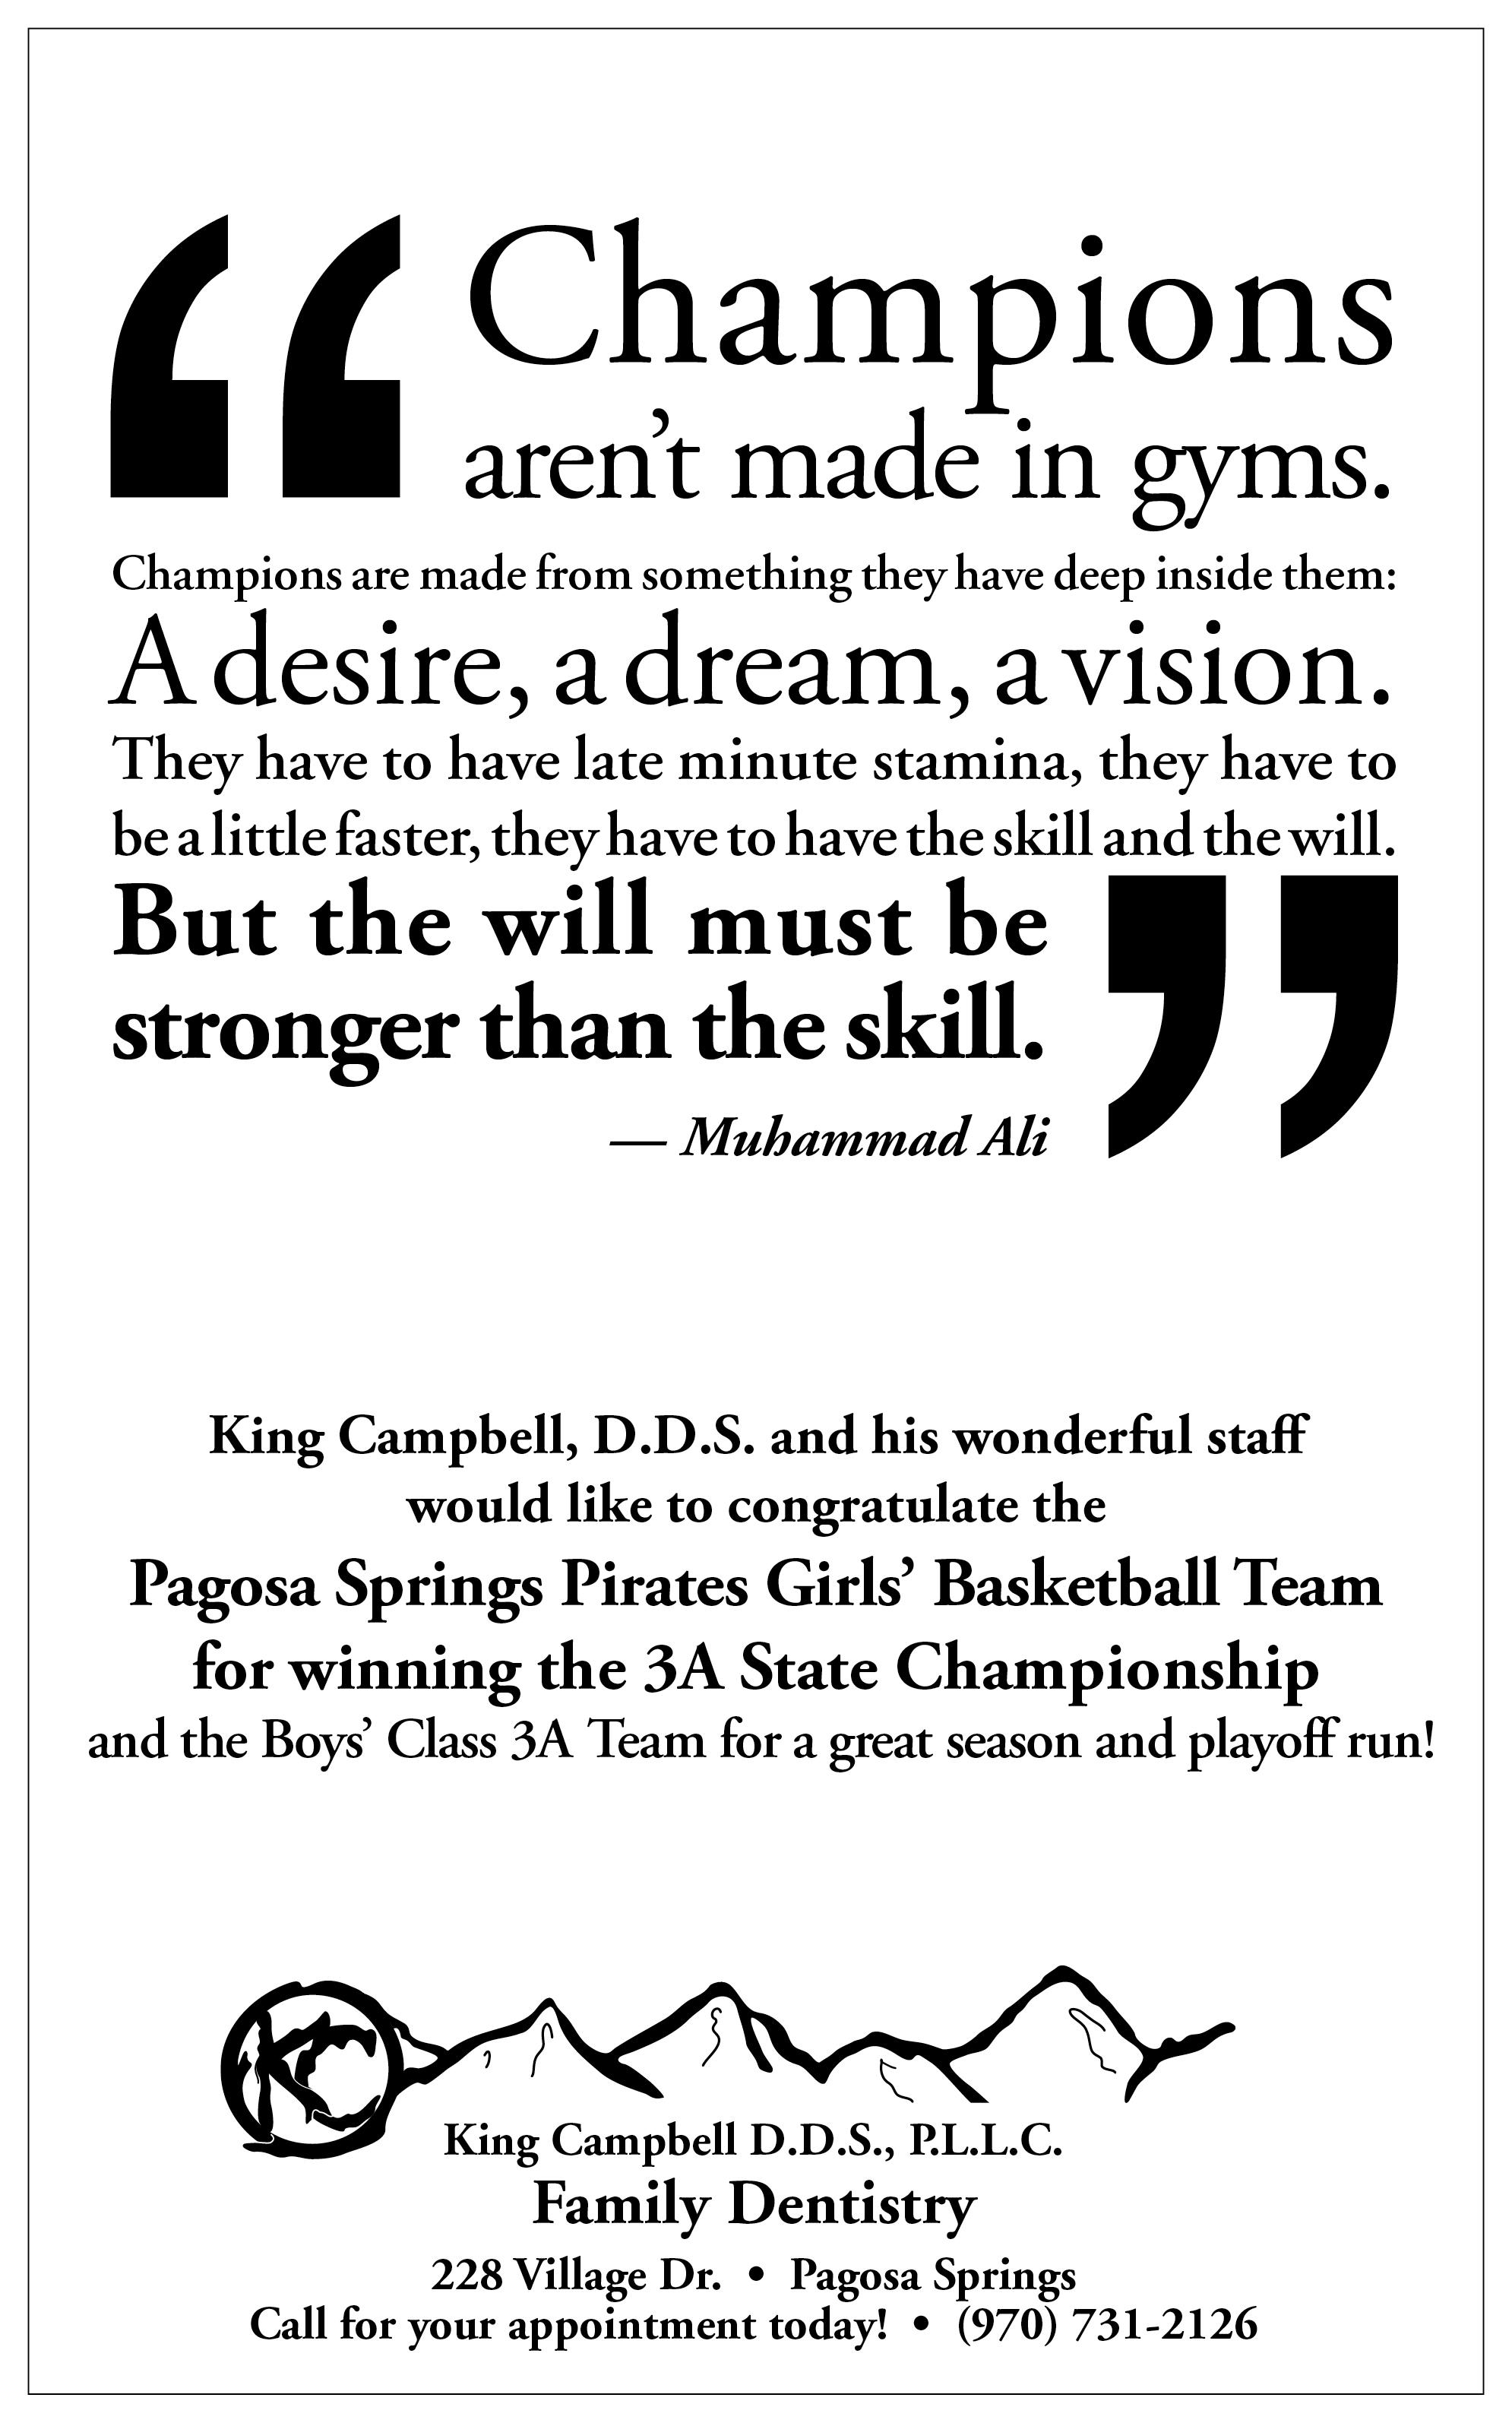 king campbell pirates 3.19.15.jpg